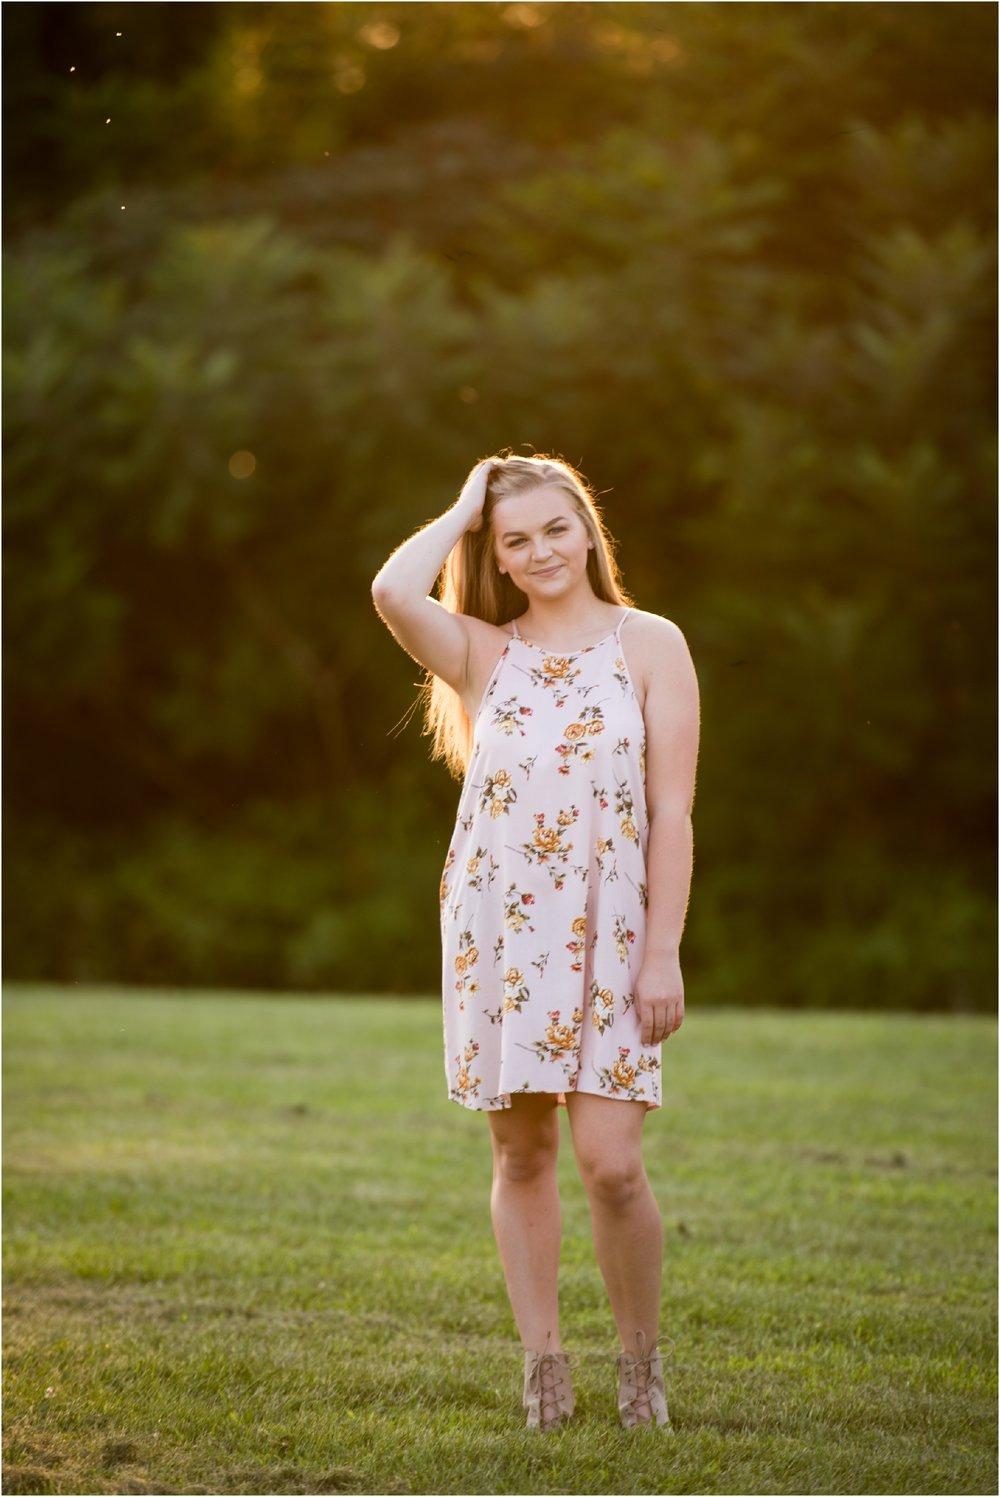 Pittsburgh Rachel Rossetti High School Senior Portrait Photography_0173.jpg